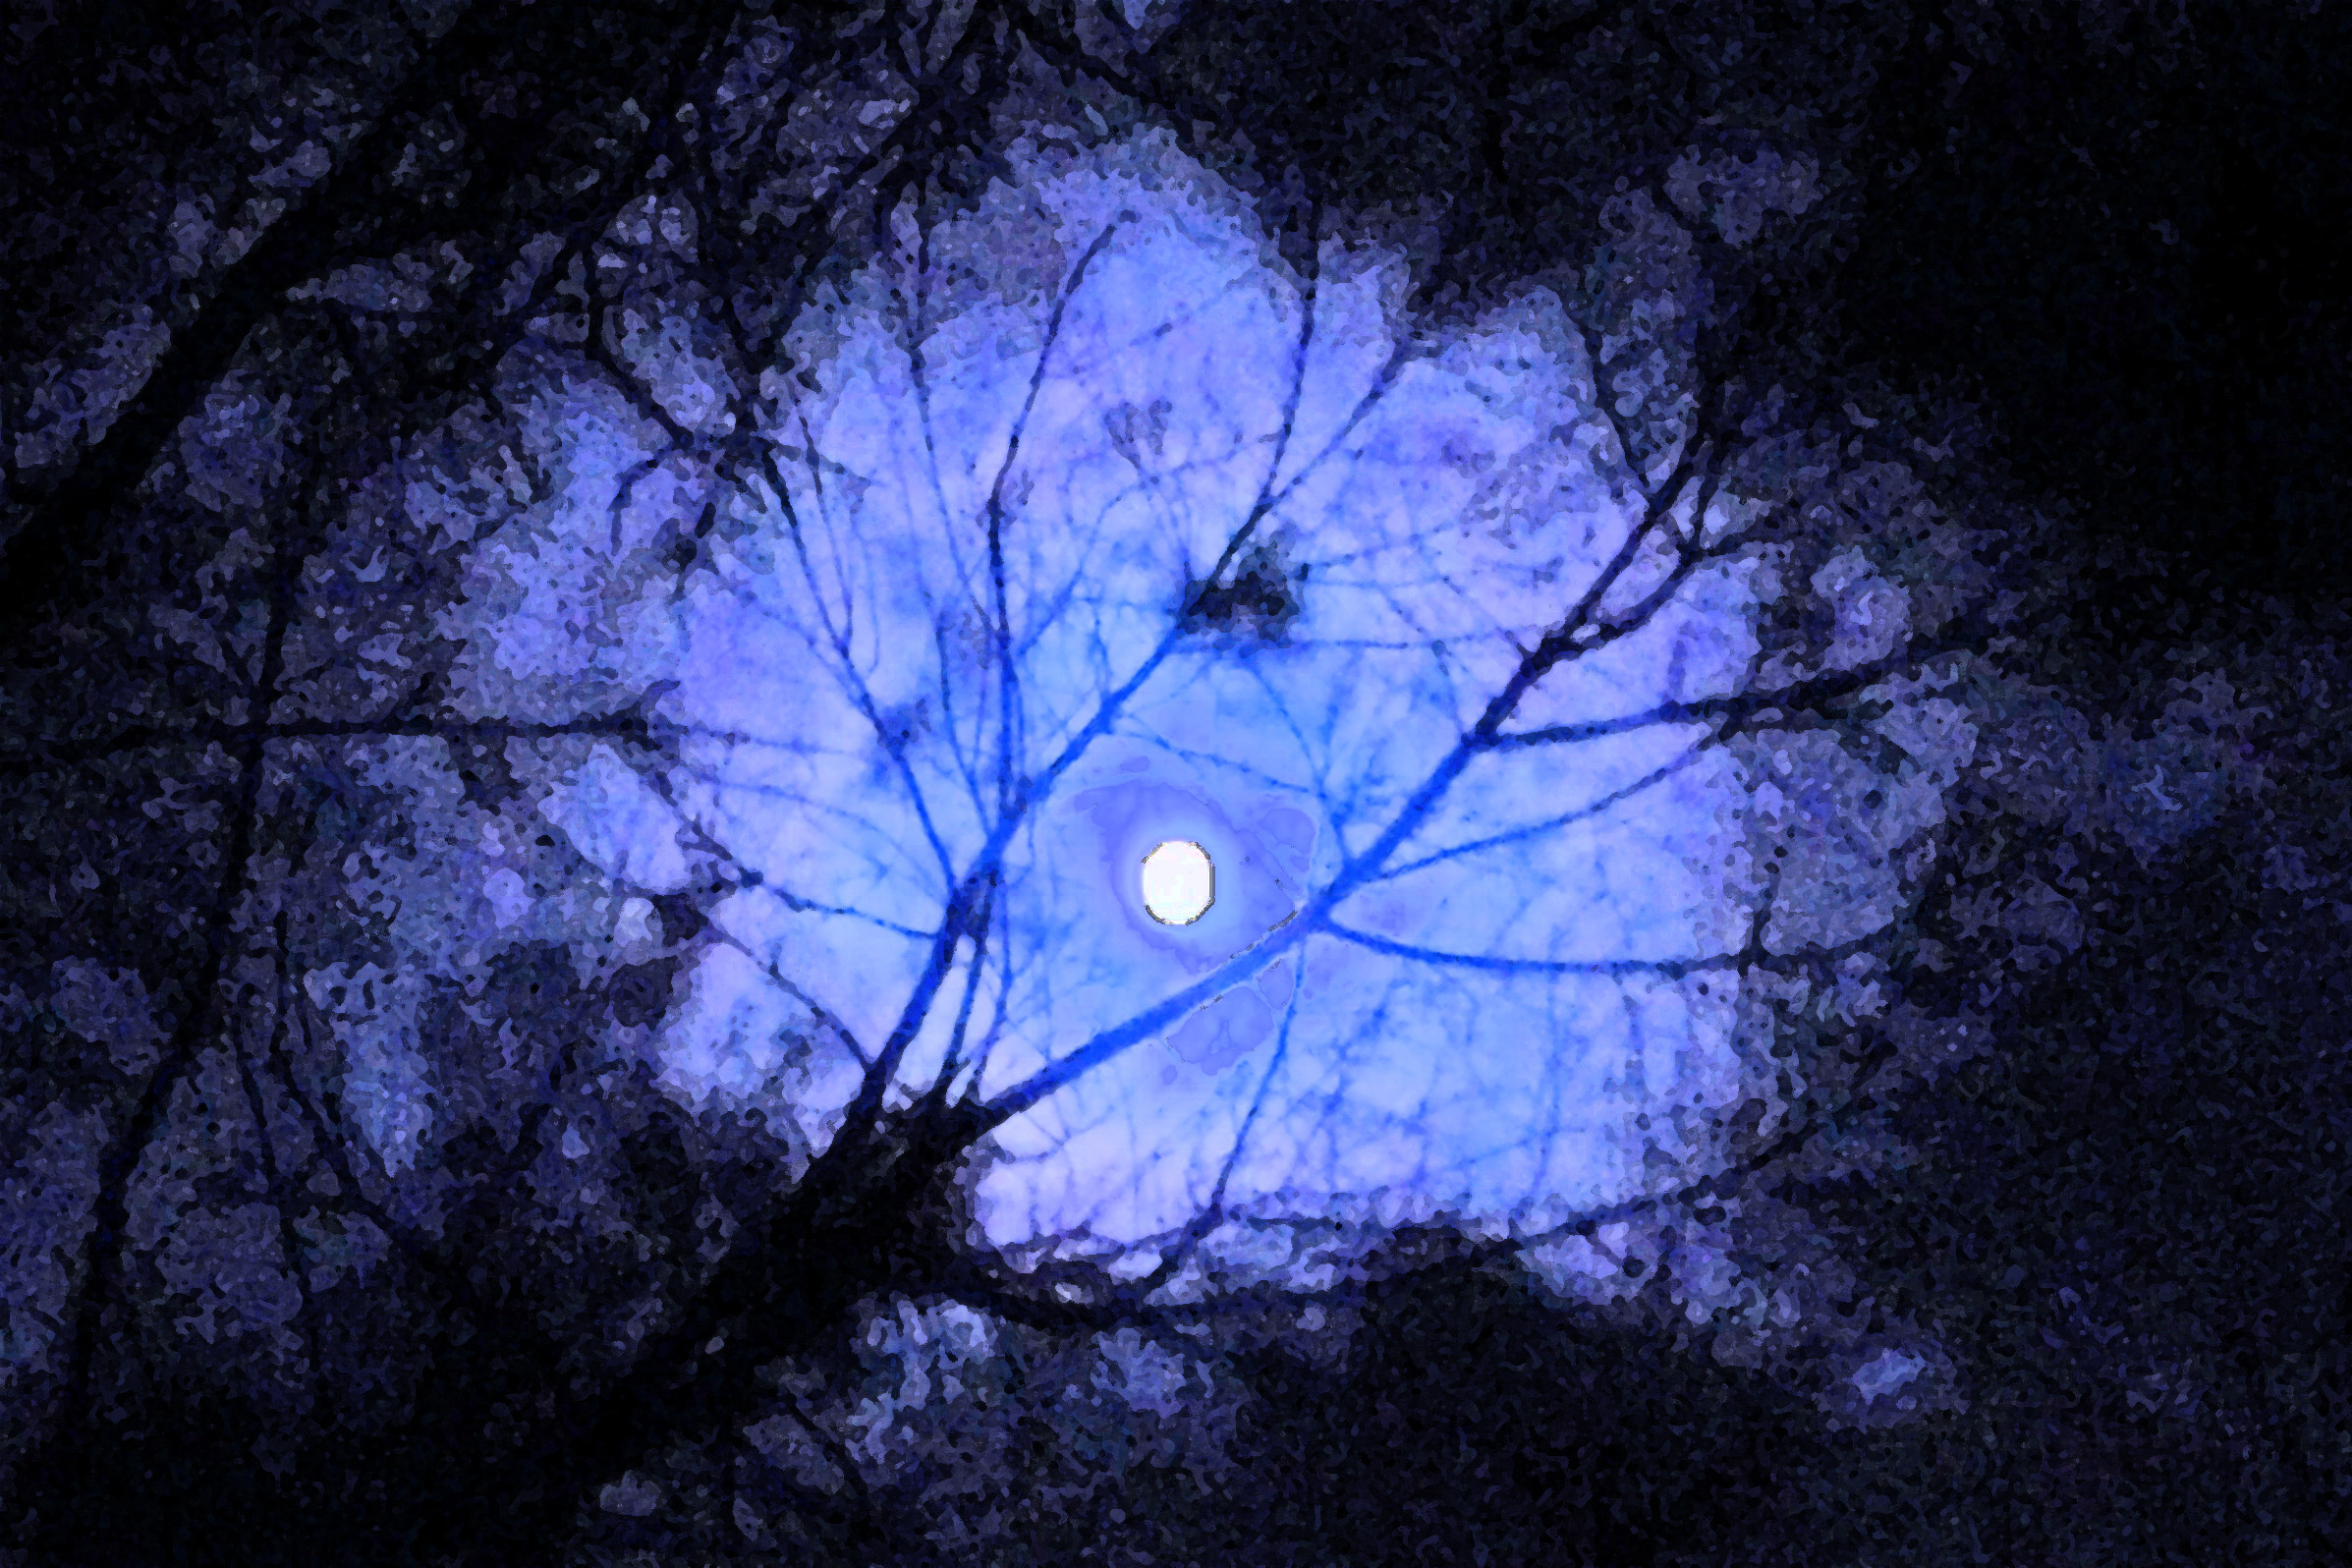 Dark sky with moon